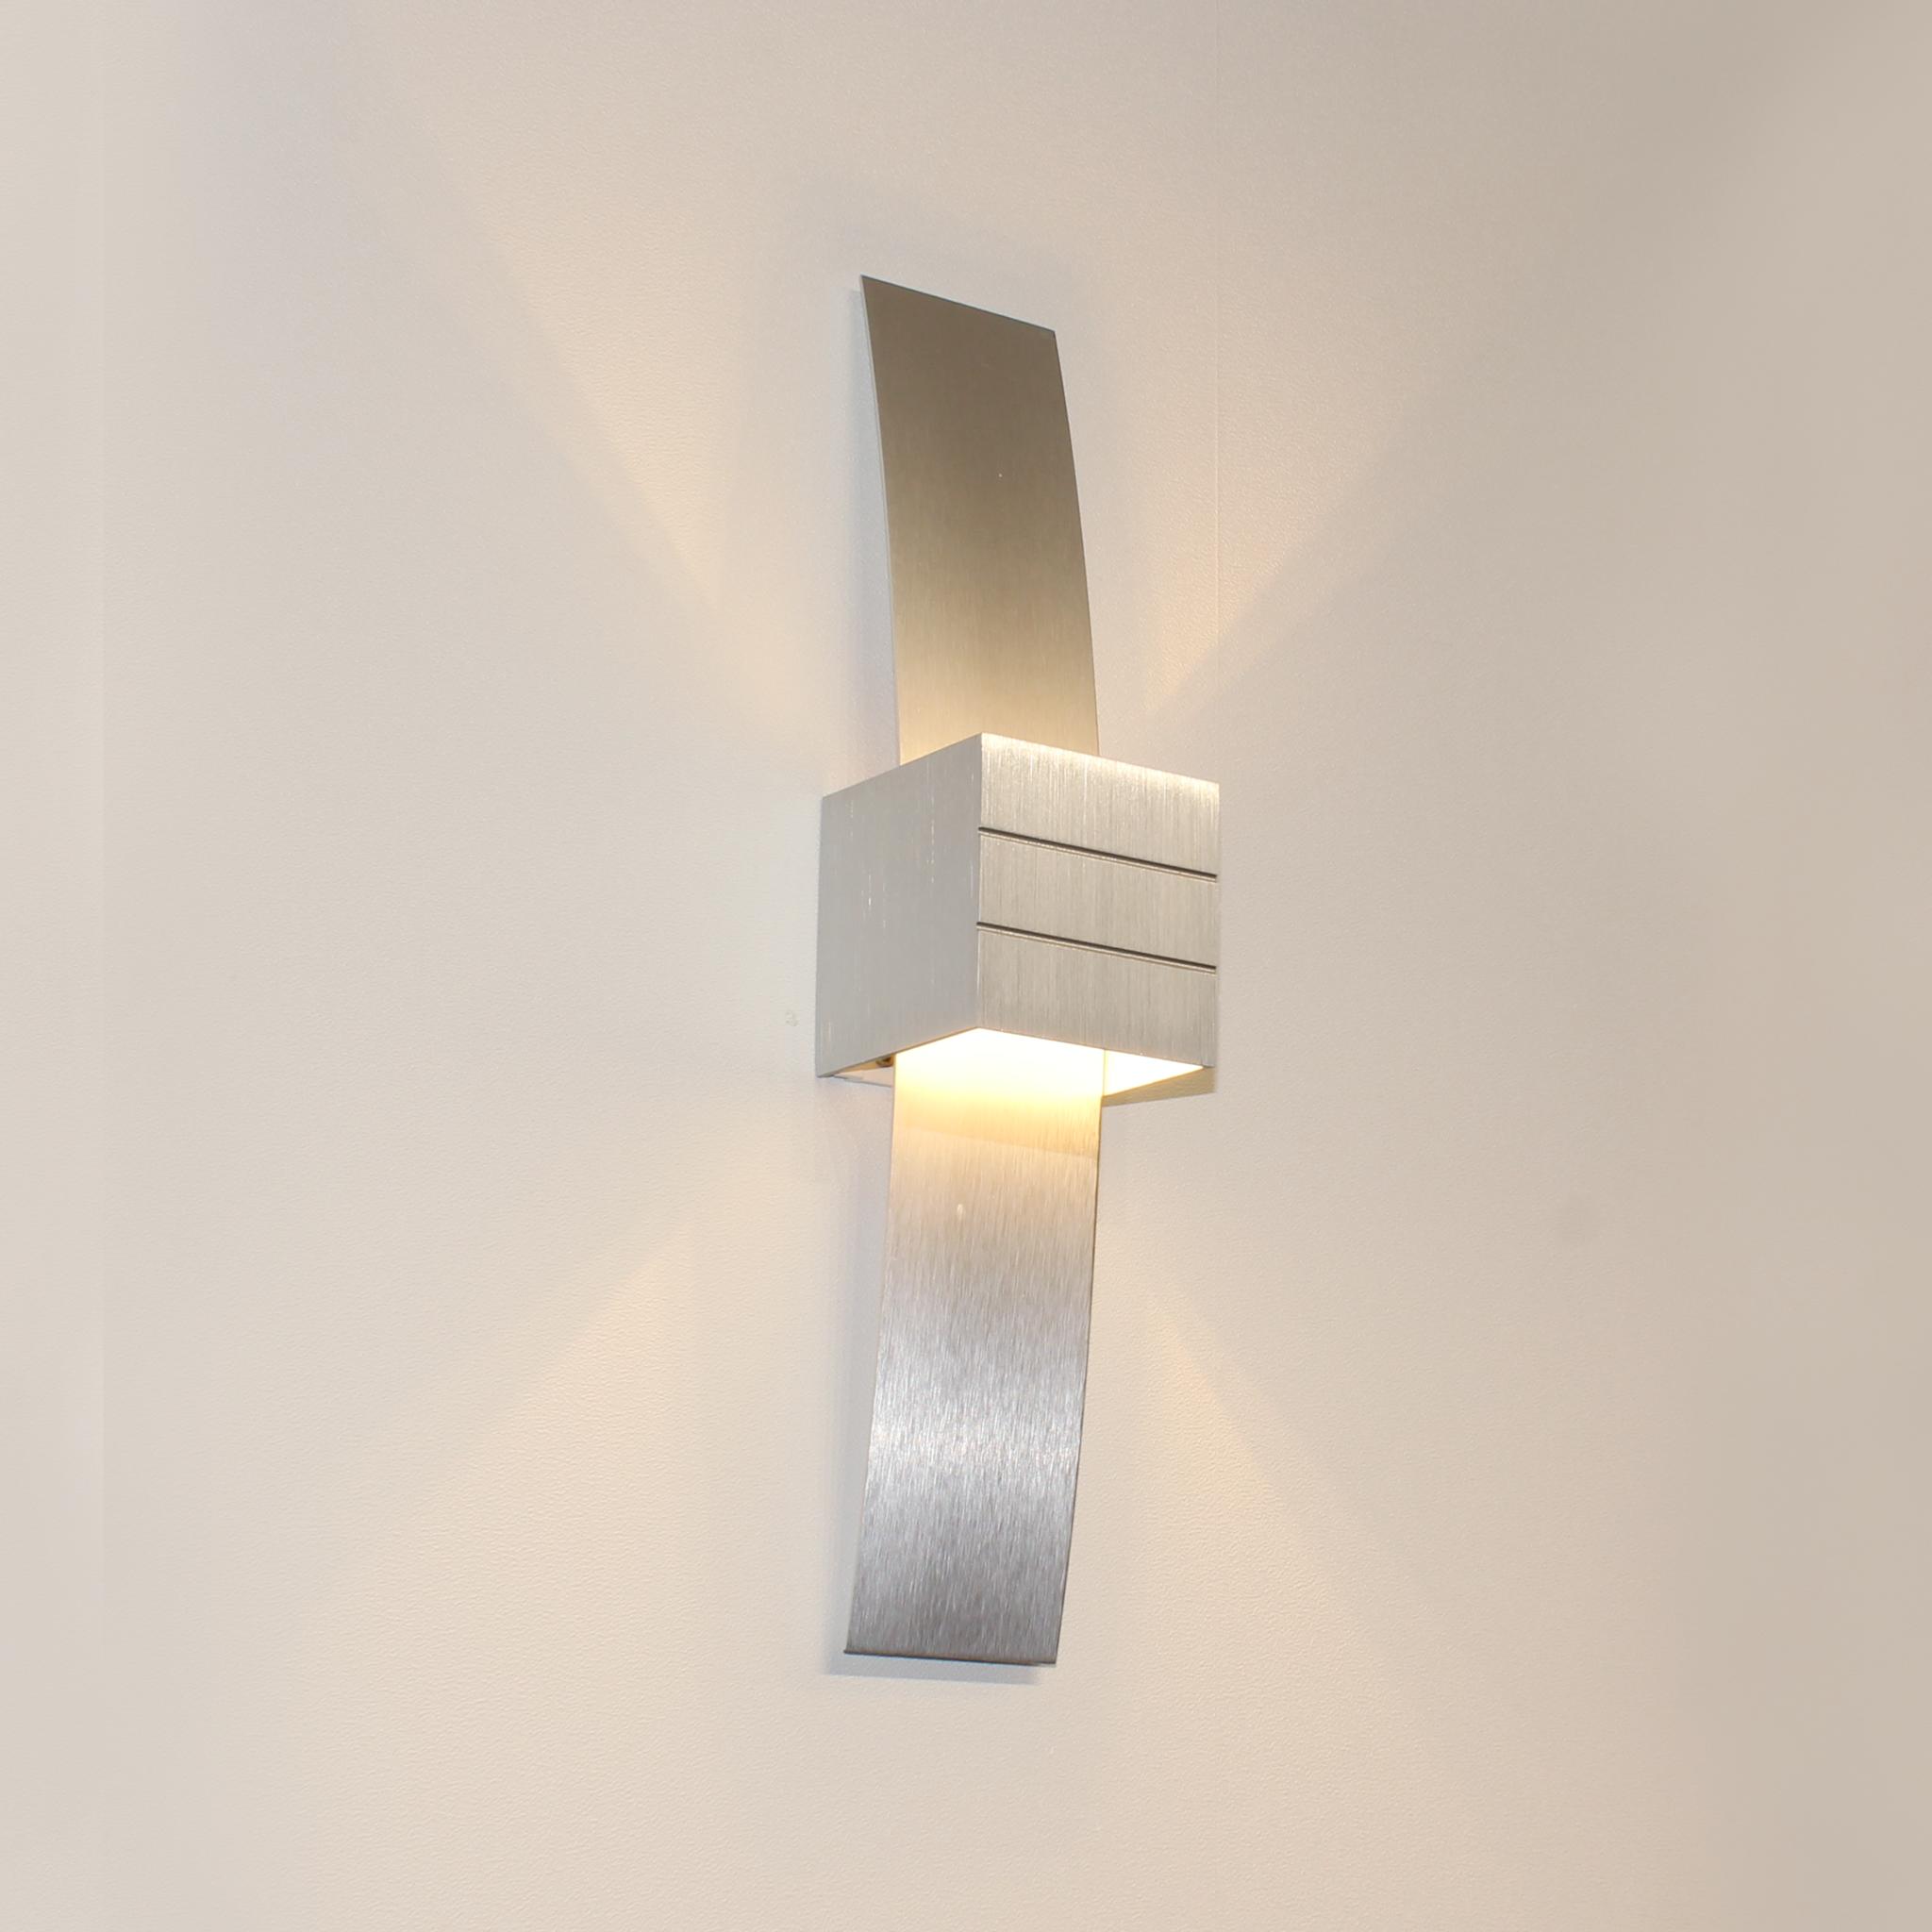 Artdelight Wandlamp Gyhum II H 39 cm B 8 cm excl. G9 aluminium